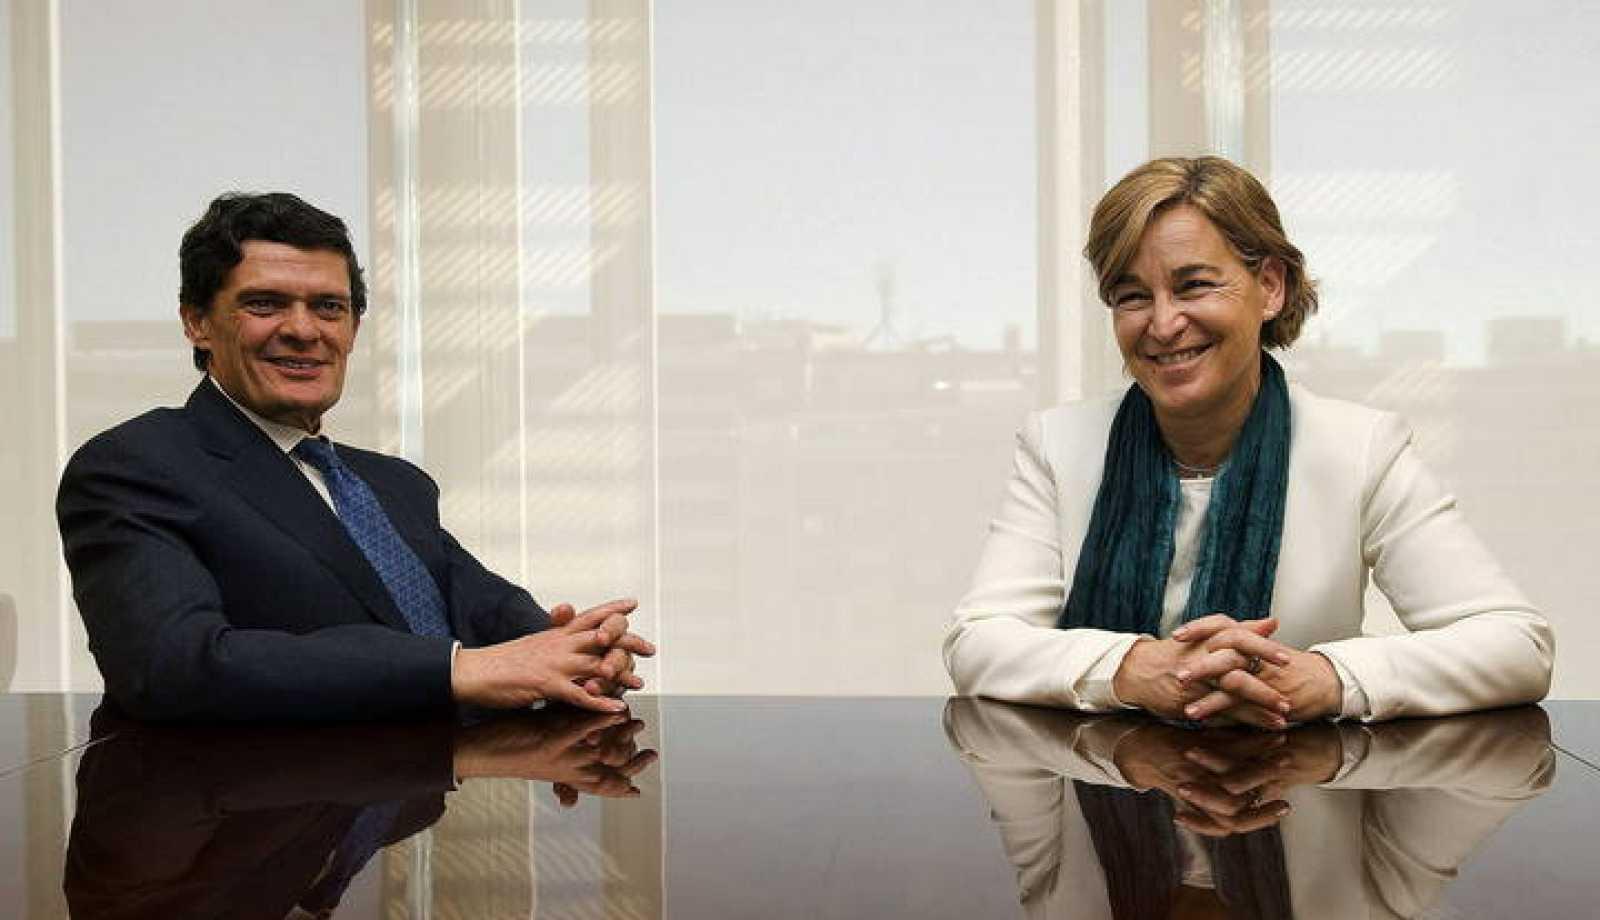 Fotografía facilitada por la Sareb de su presidenta, Belén Romana, junto a Jaime Echegoyen.